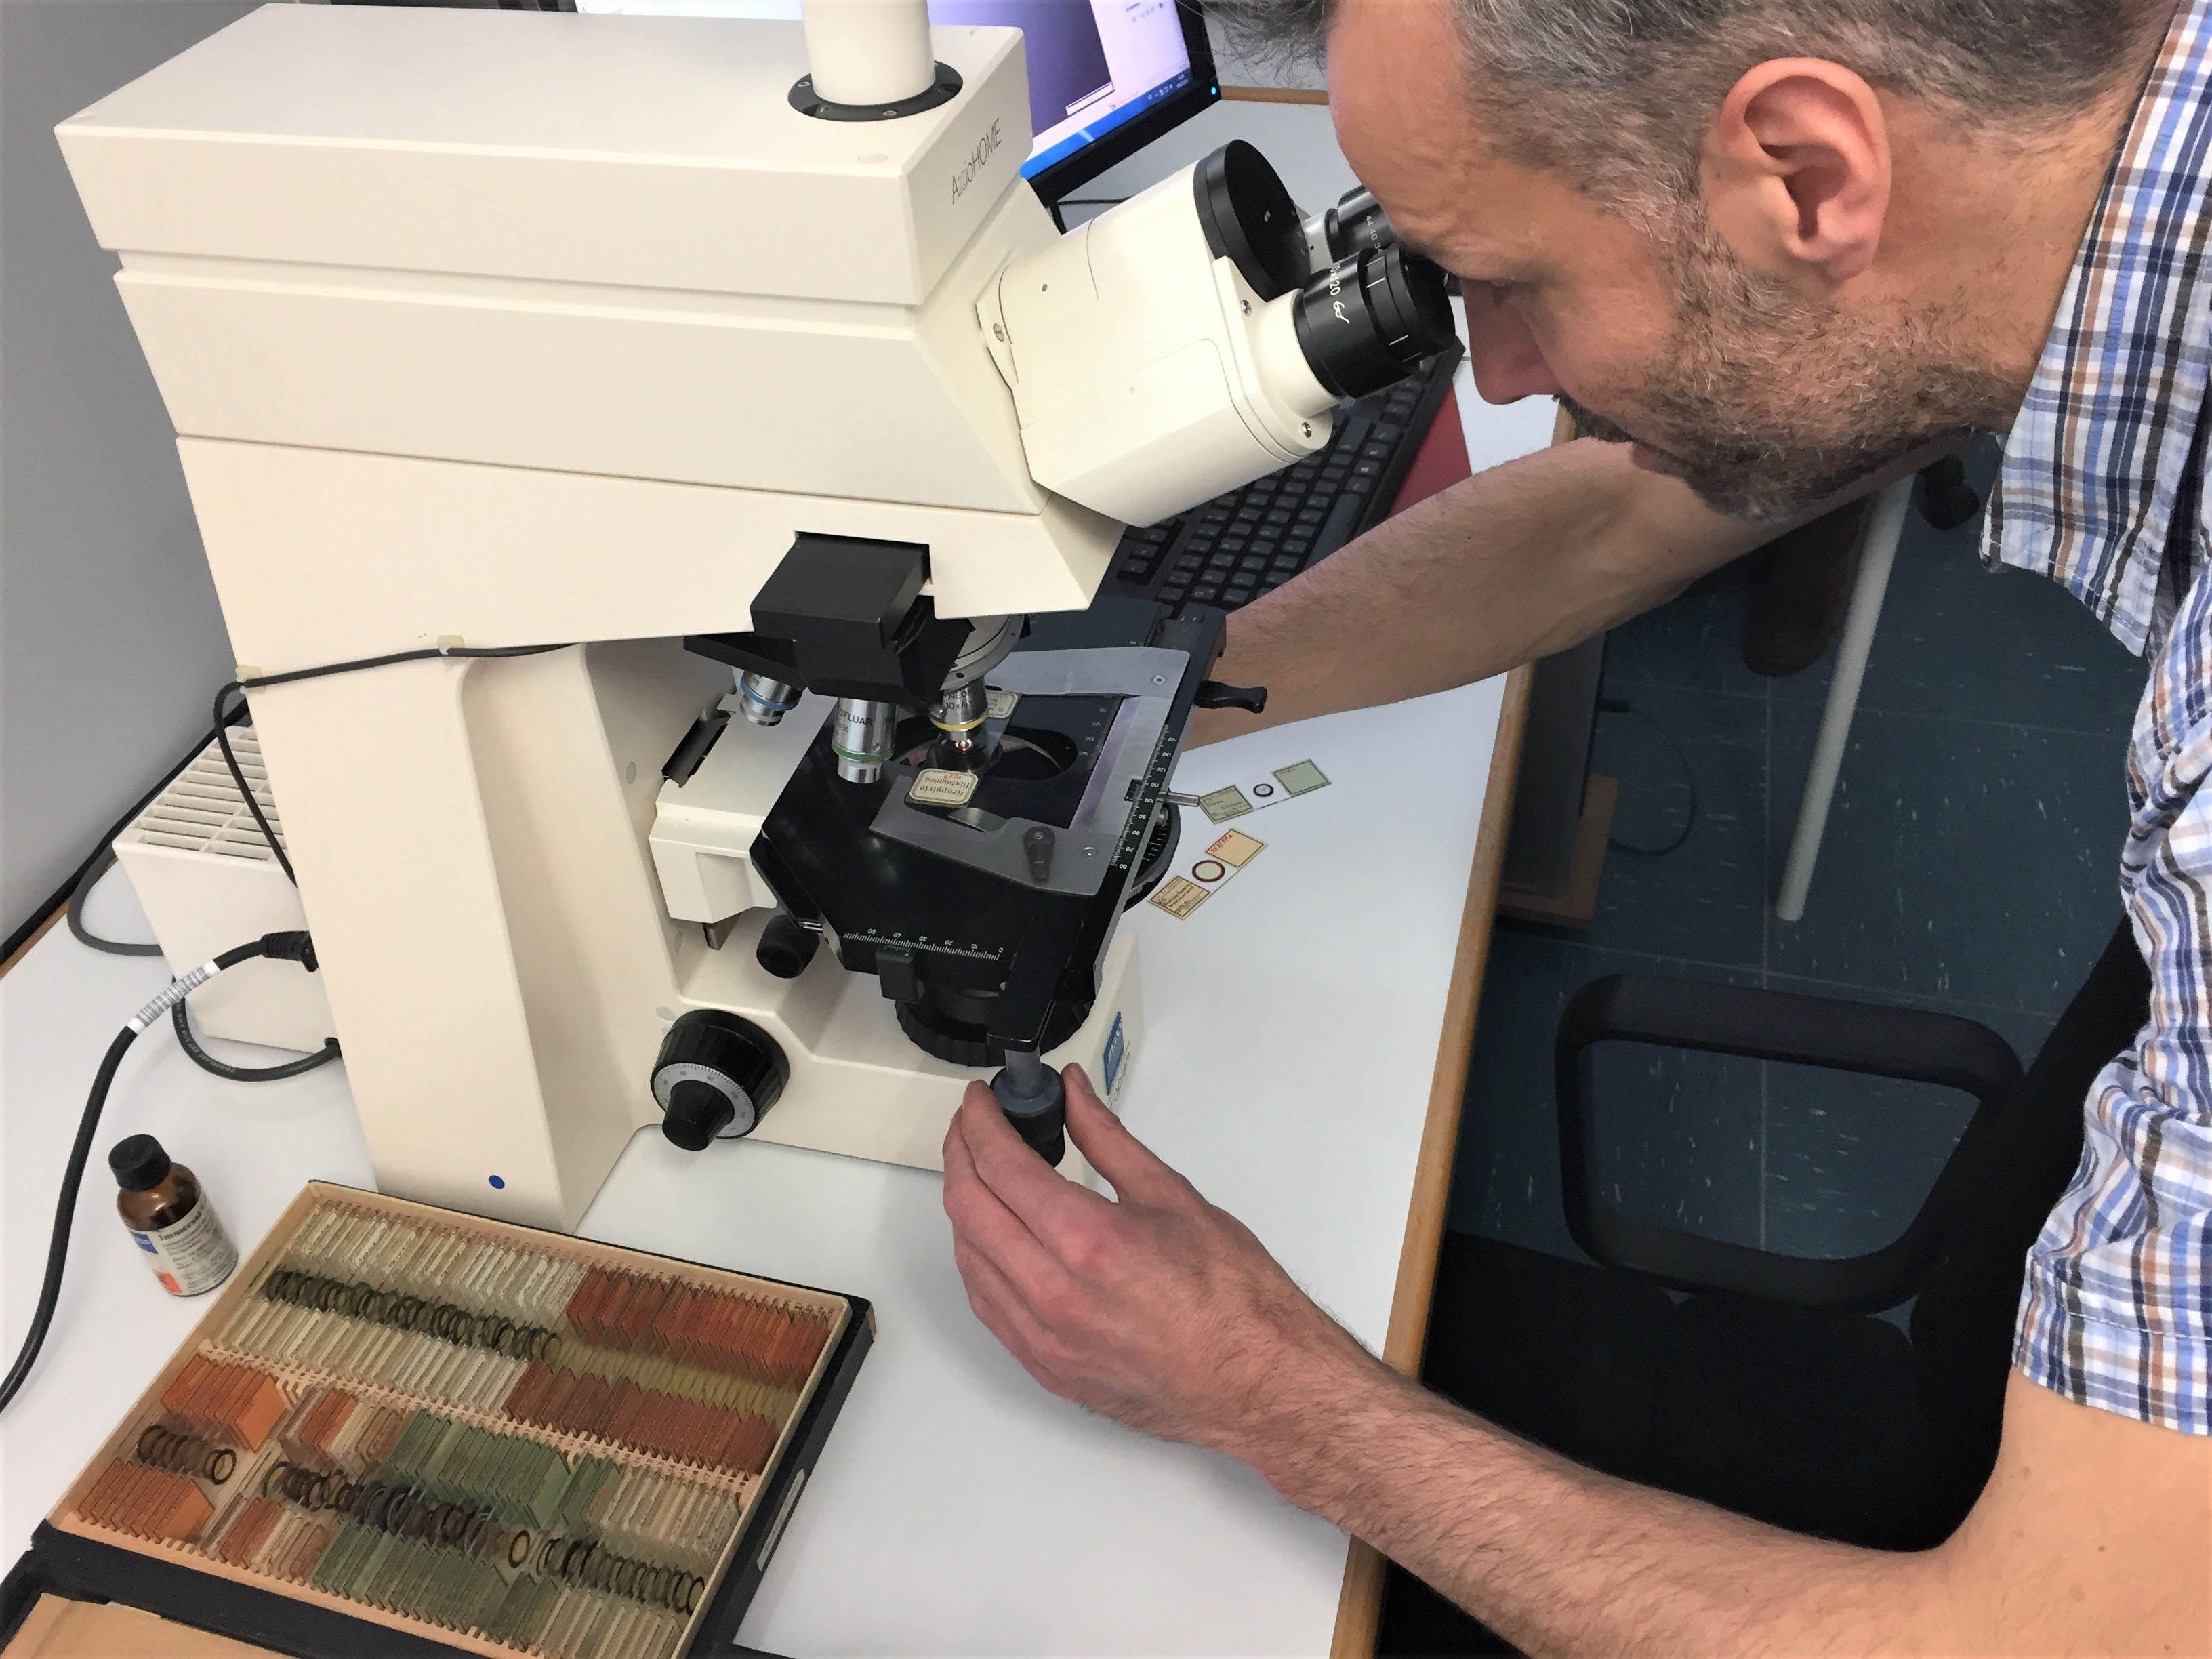 diatoms under the microscope3